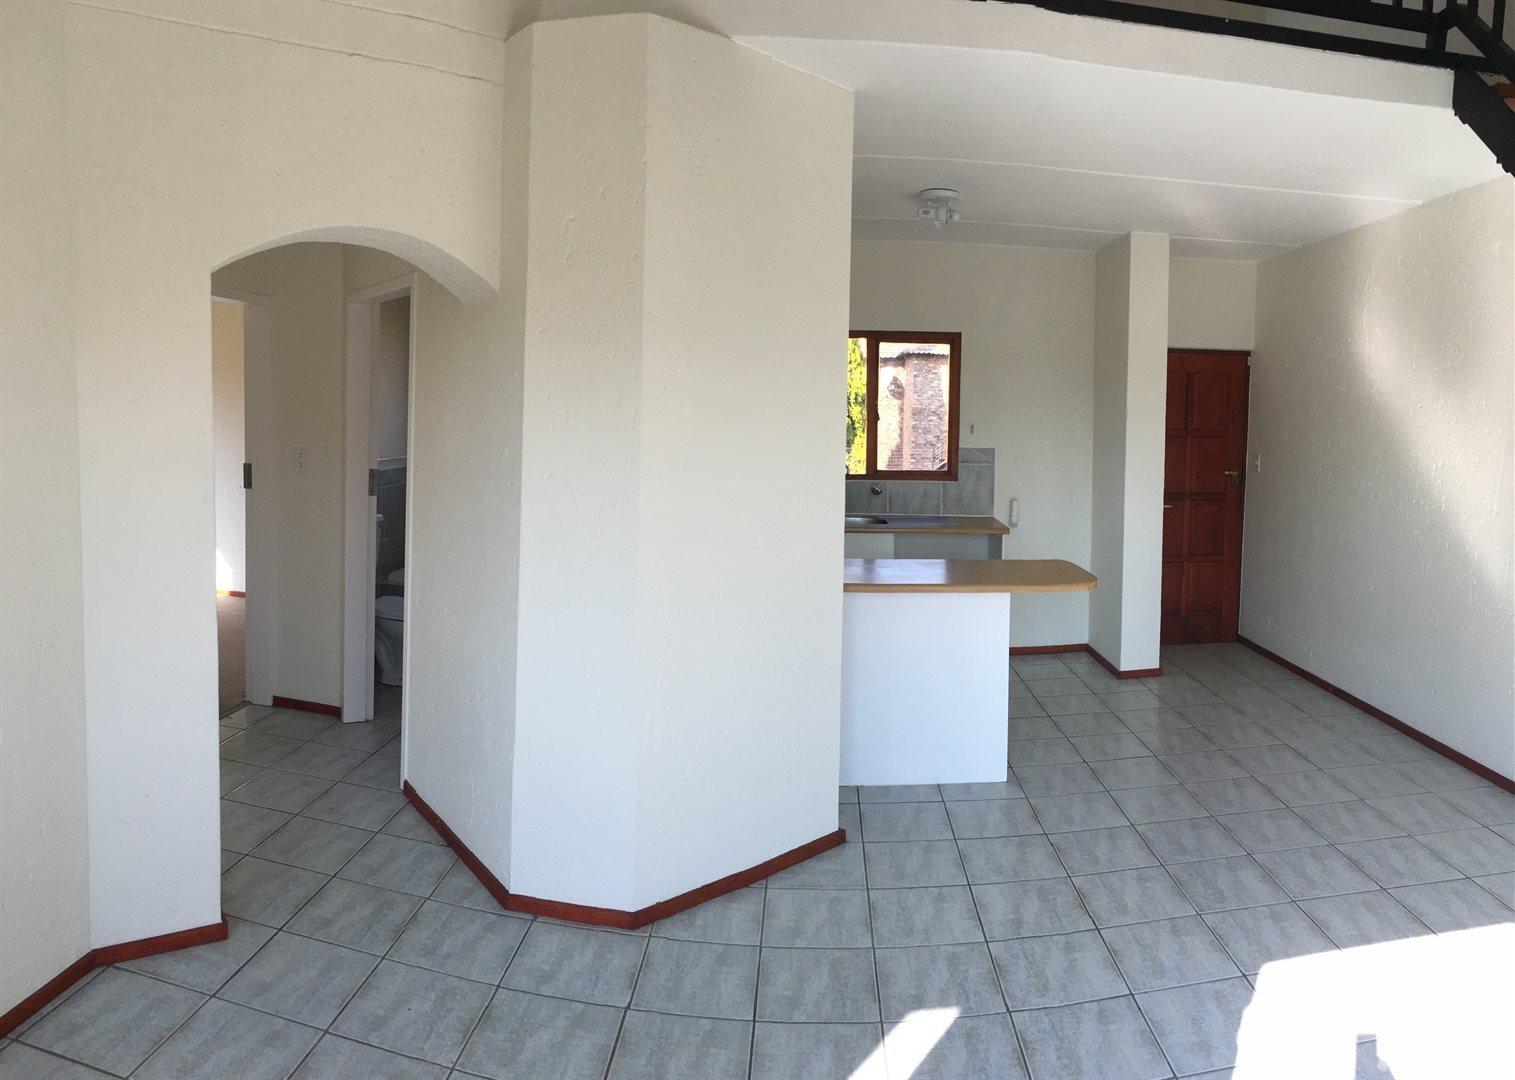 Randburg, Bromhof Property  | Houses For Sale Bromhof, Bromhof, Apartment 2 bedrooms property for sale Price:755,000